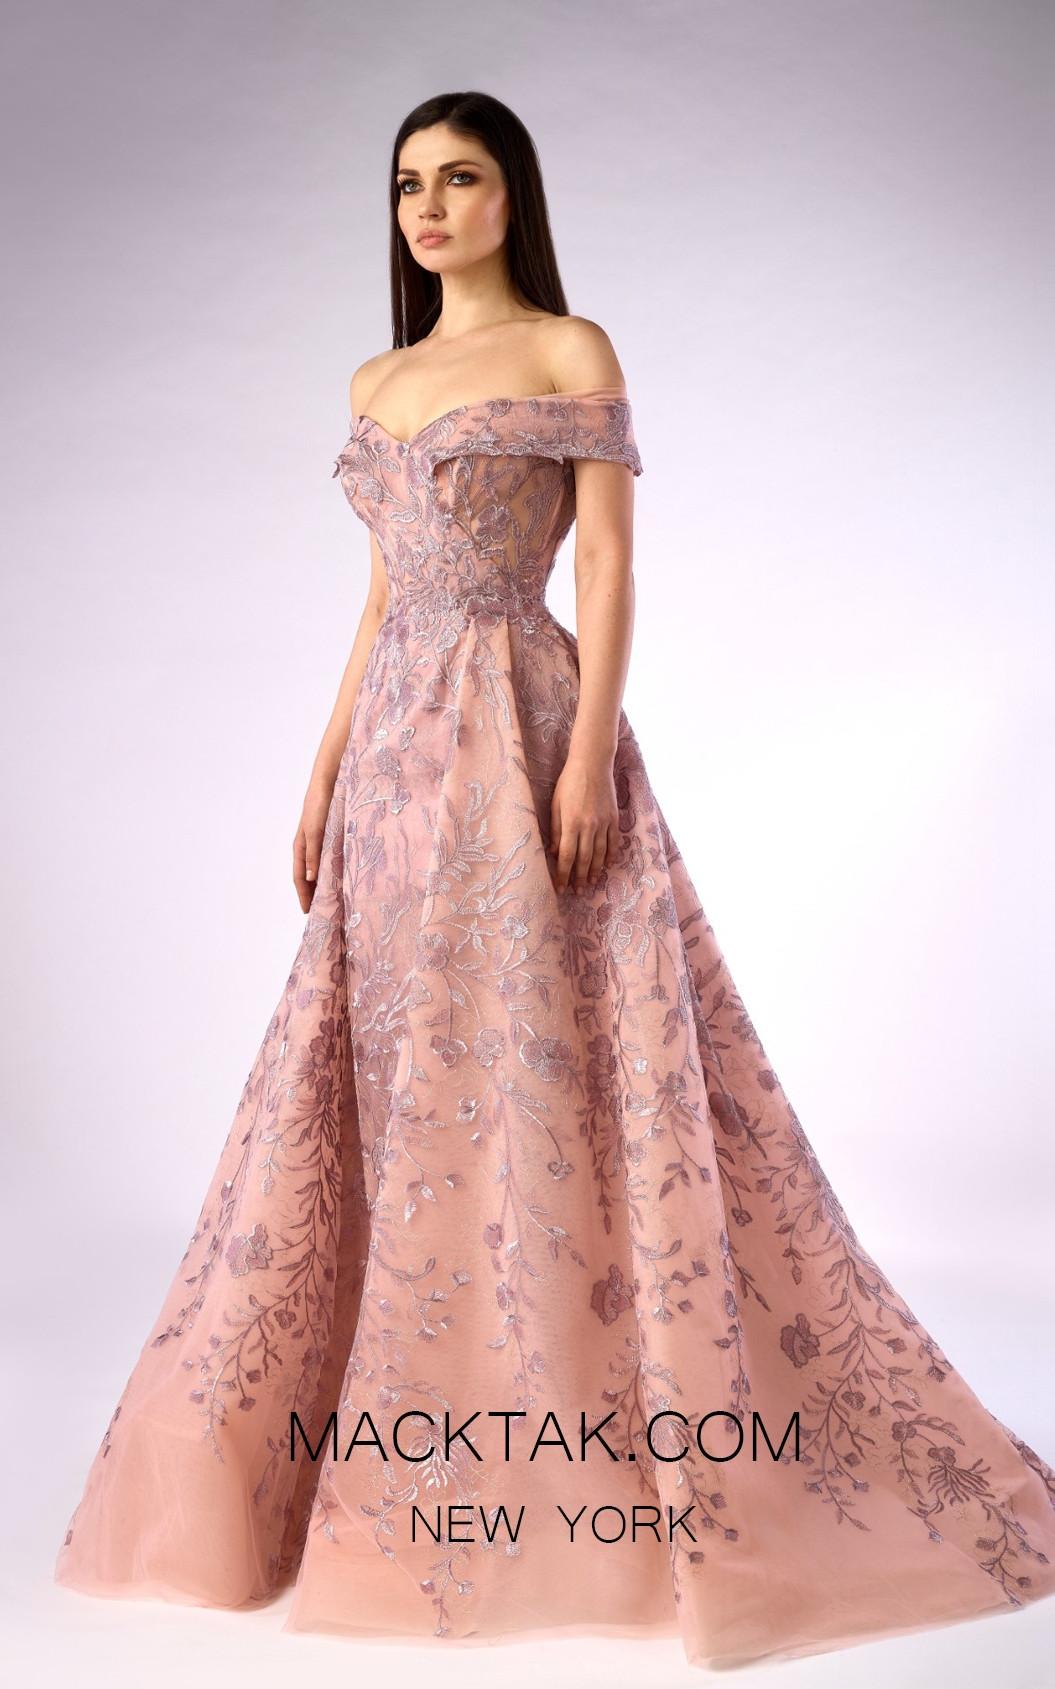 Gatti Nolli OP4777 Front Dress